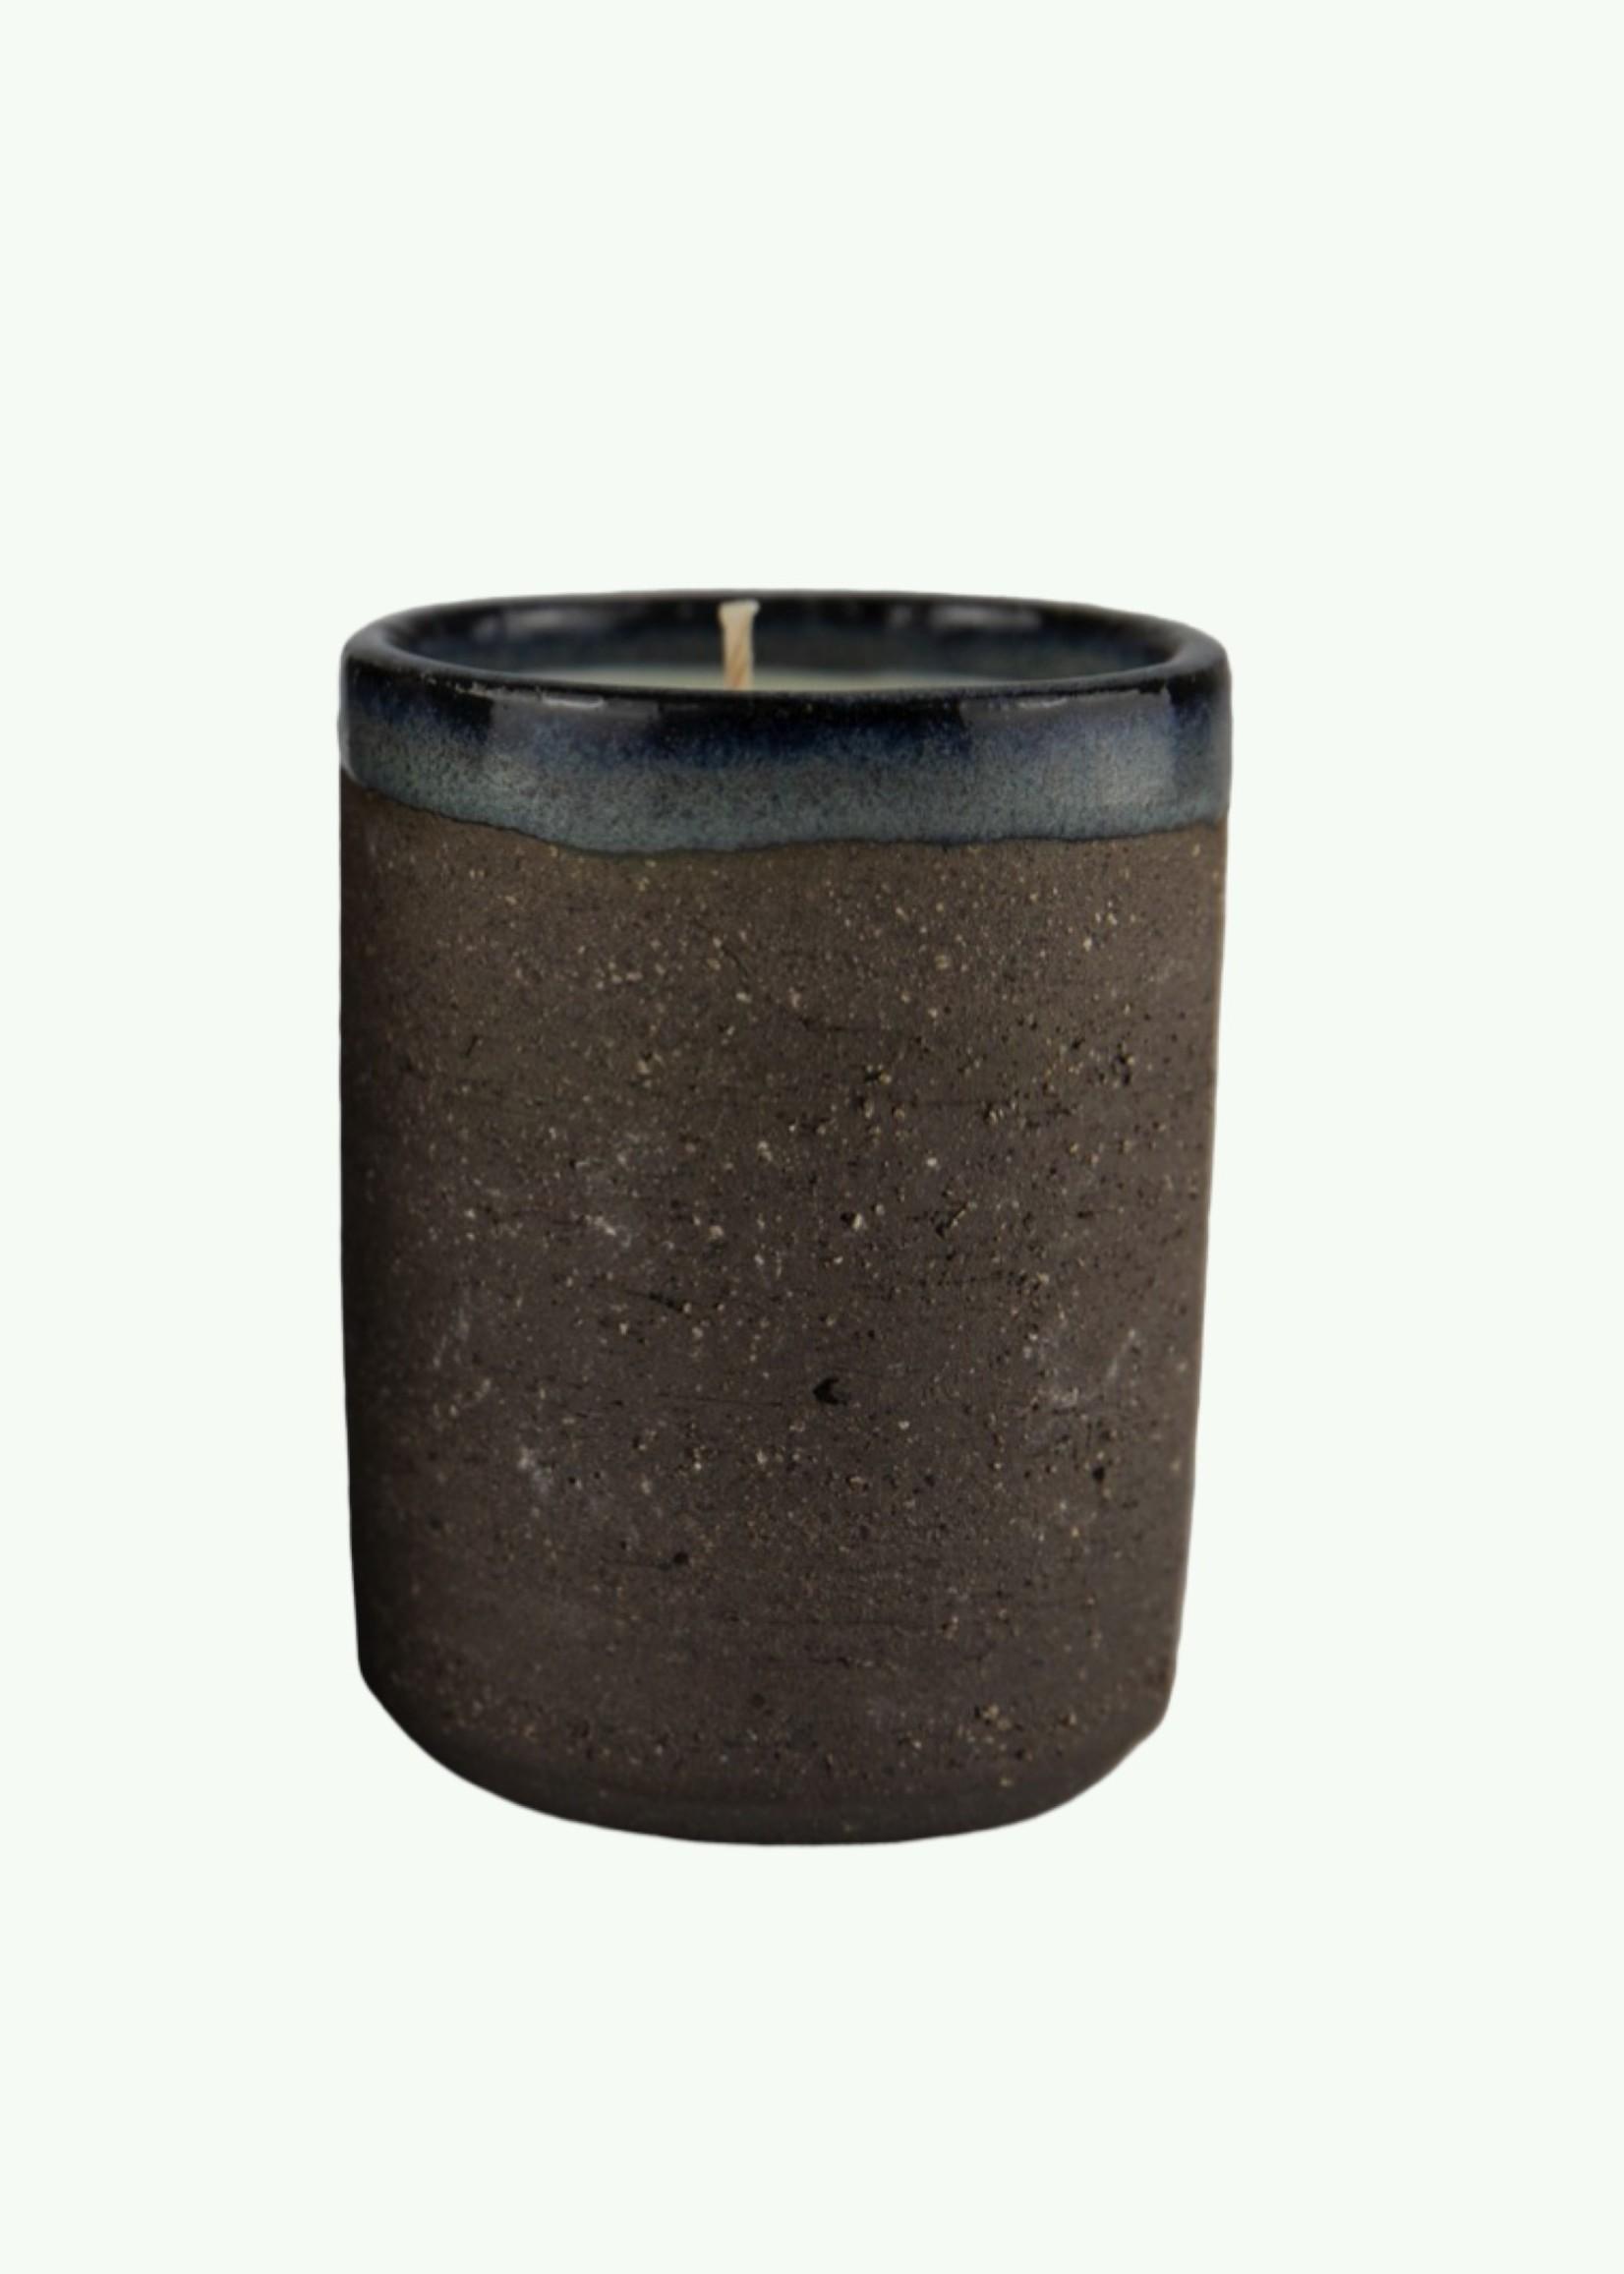 AER AER - At Dusk - Geurkaars 125 ml